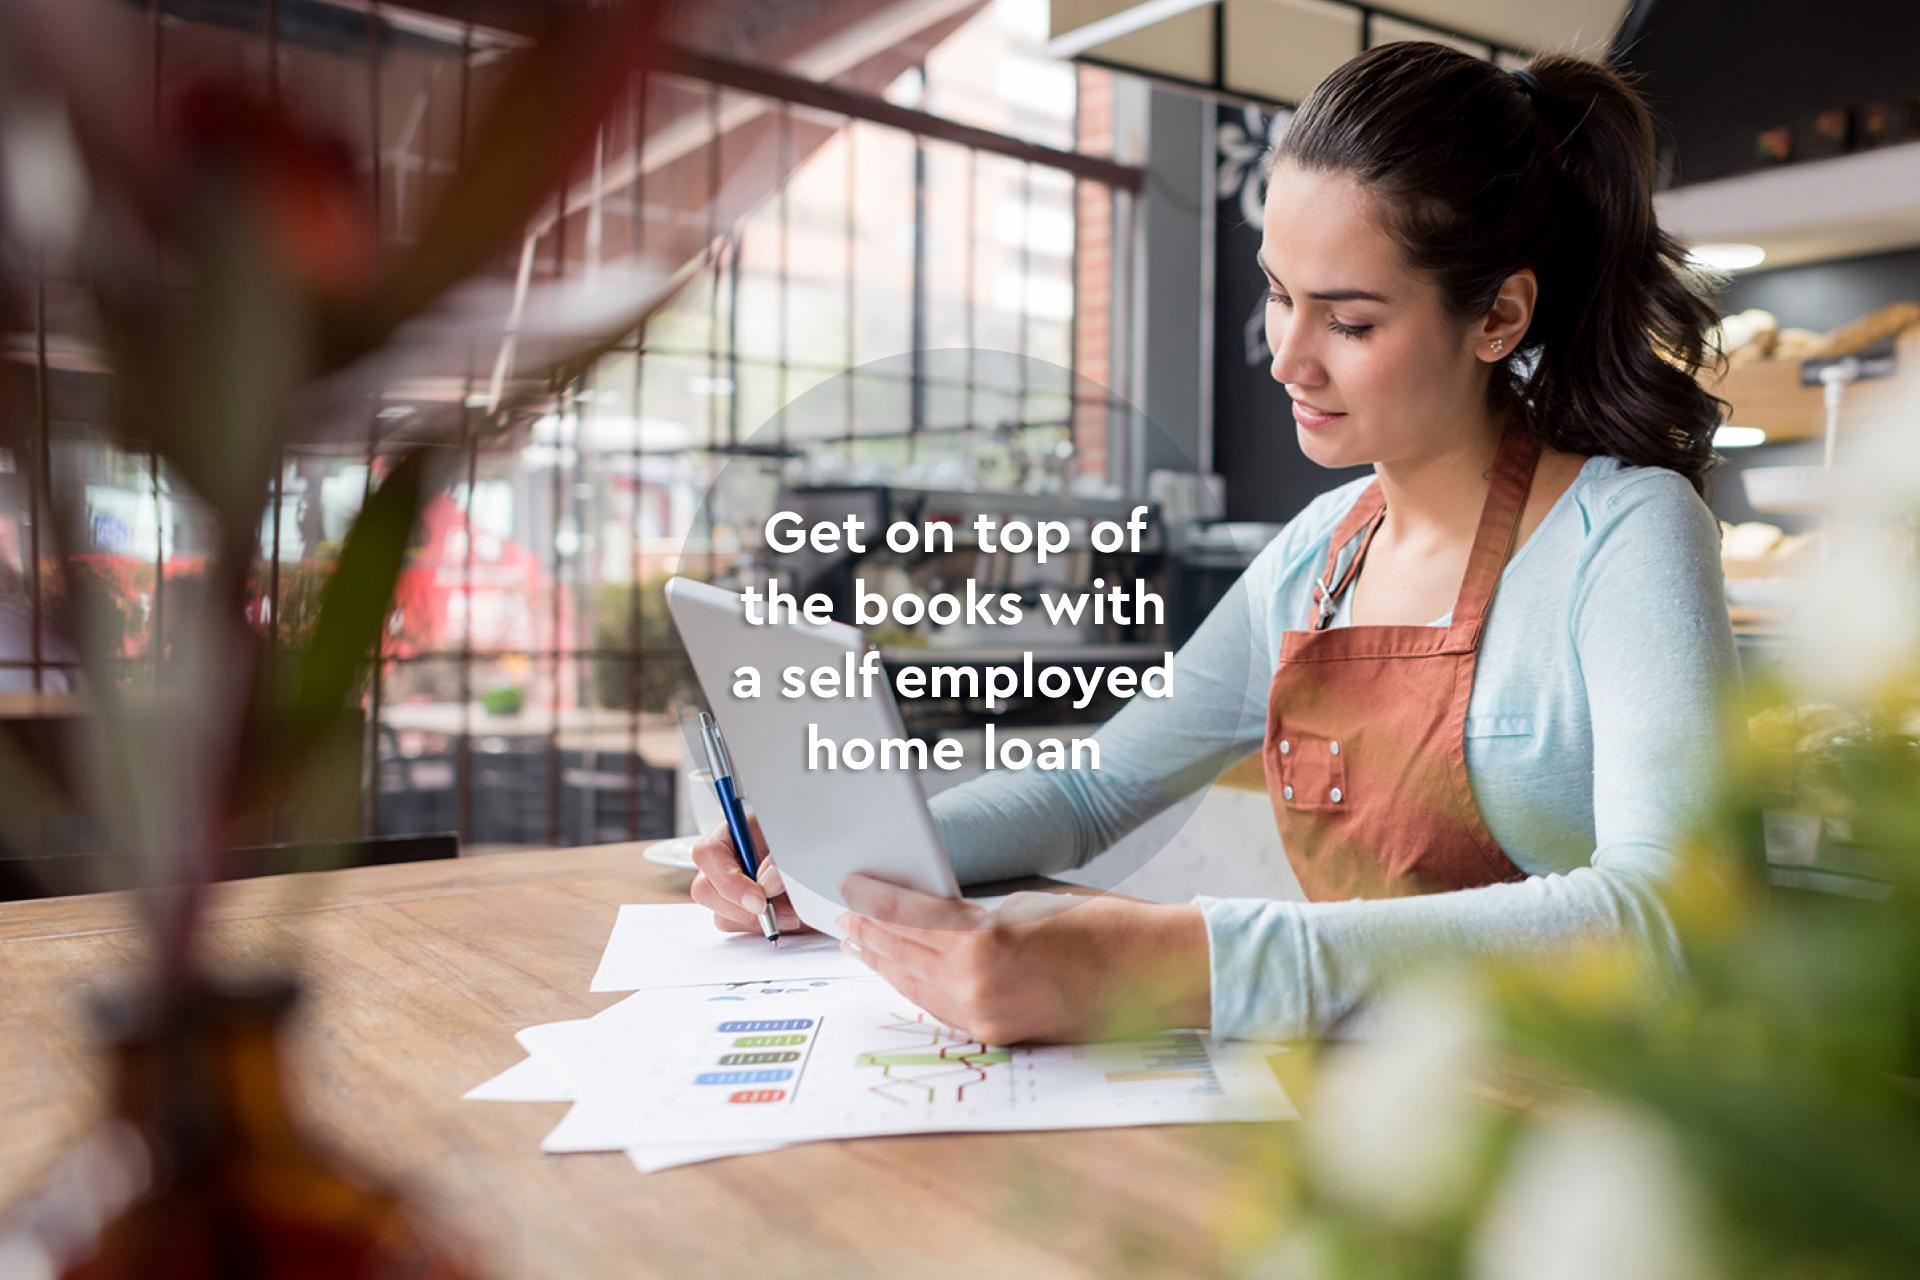 self employed home loan_banner.jpg